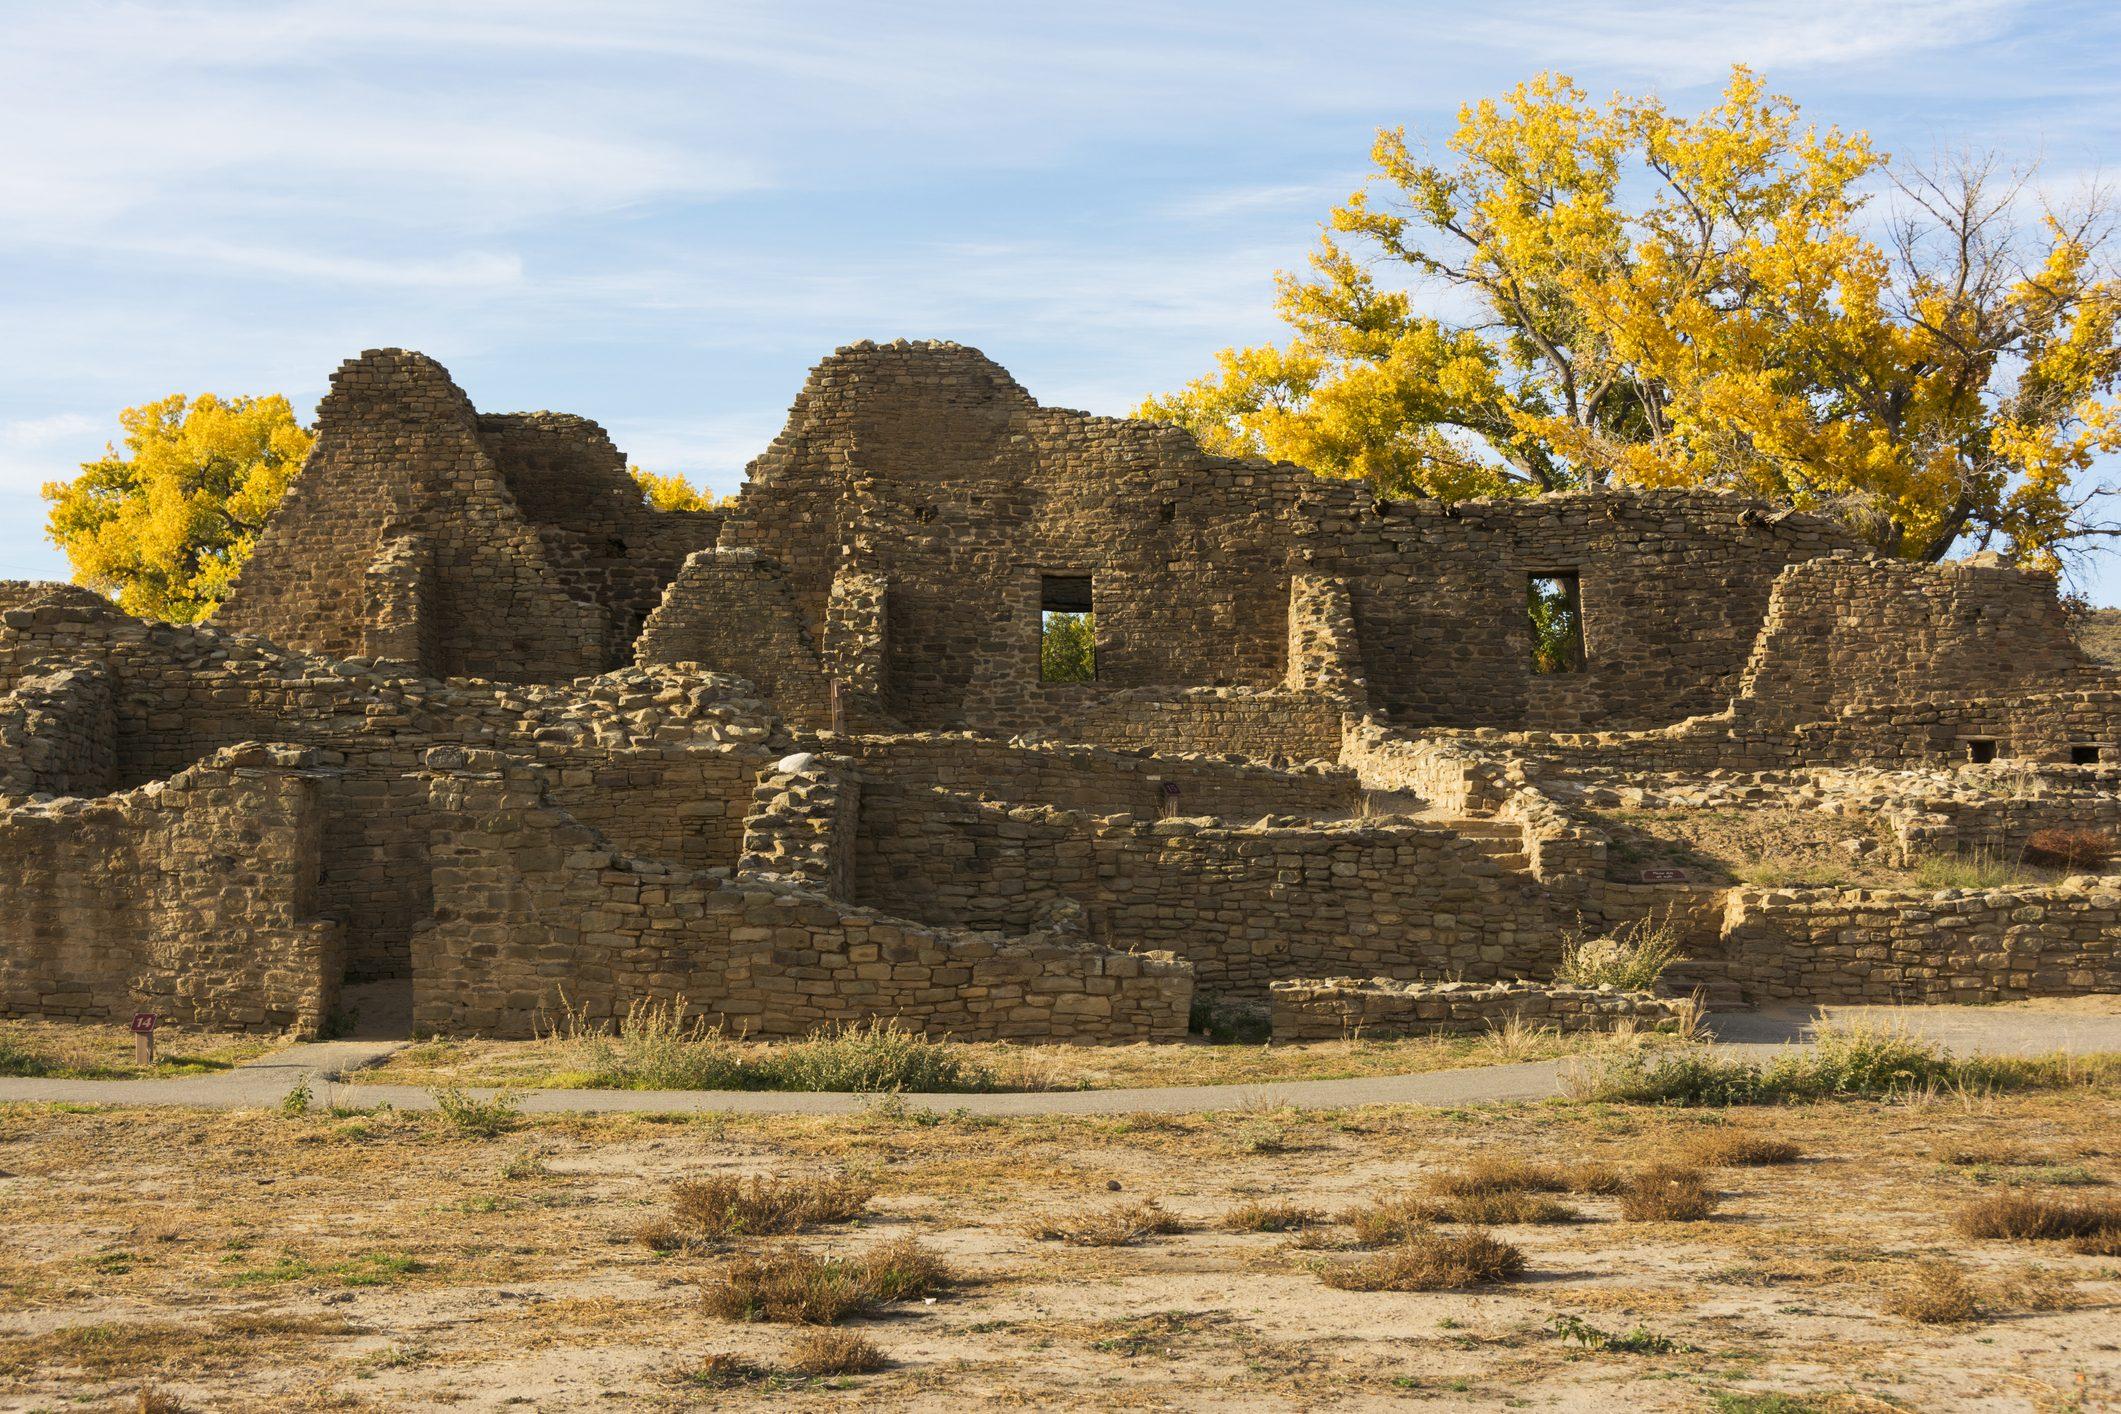 Aztec Ruins National Monument, ruins